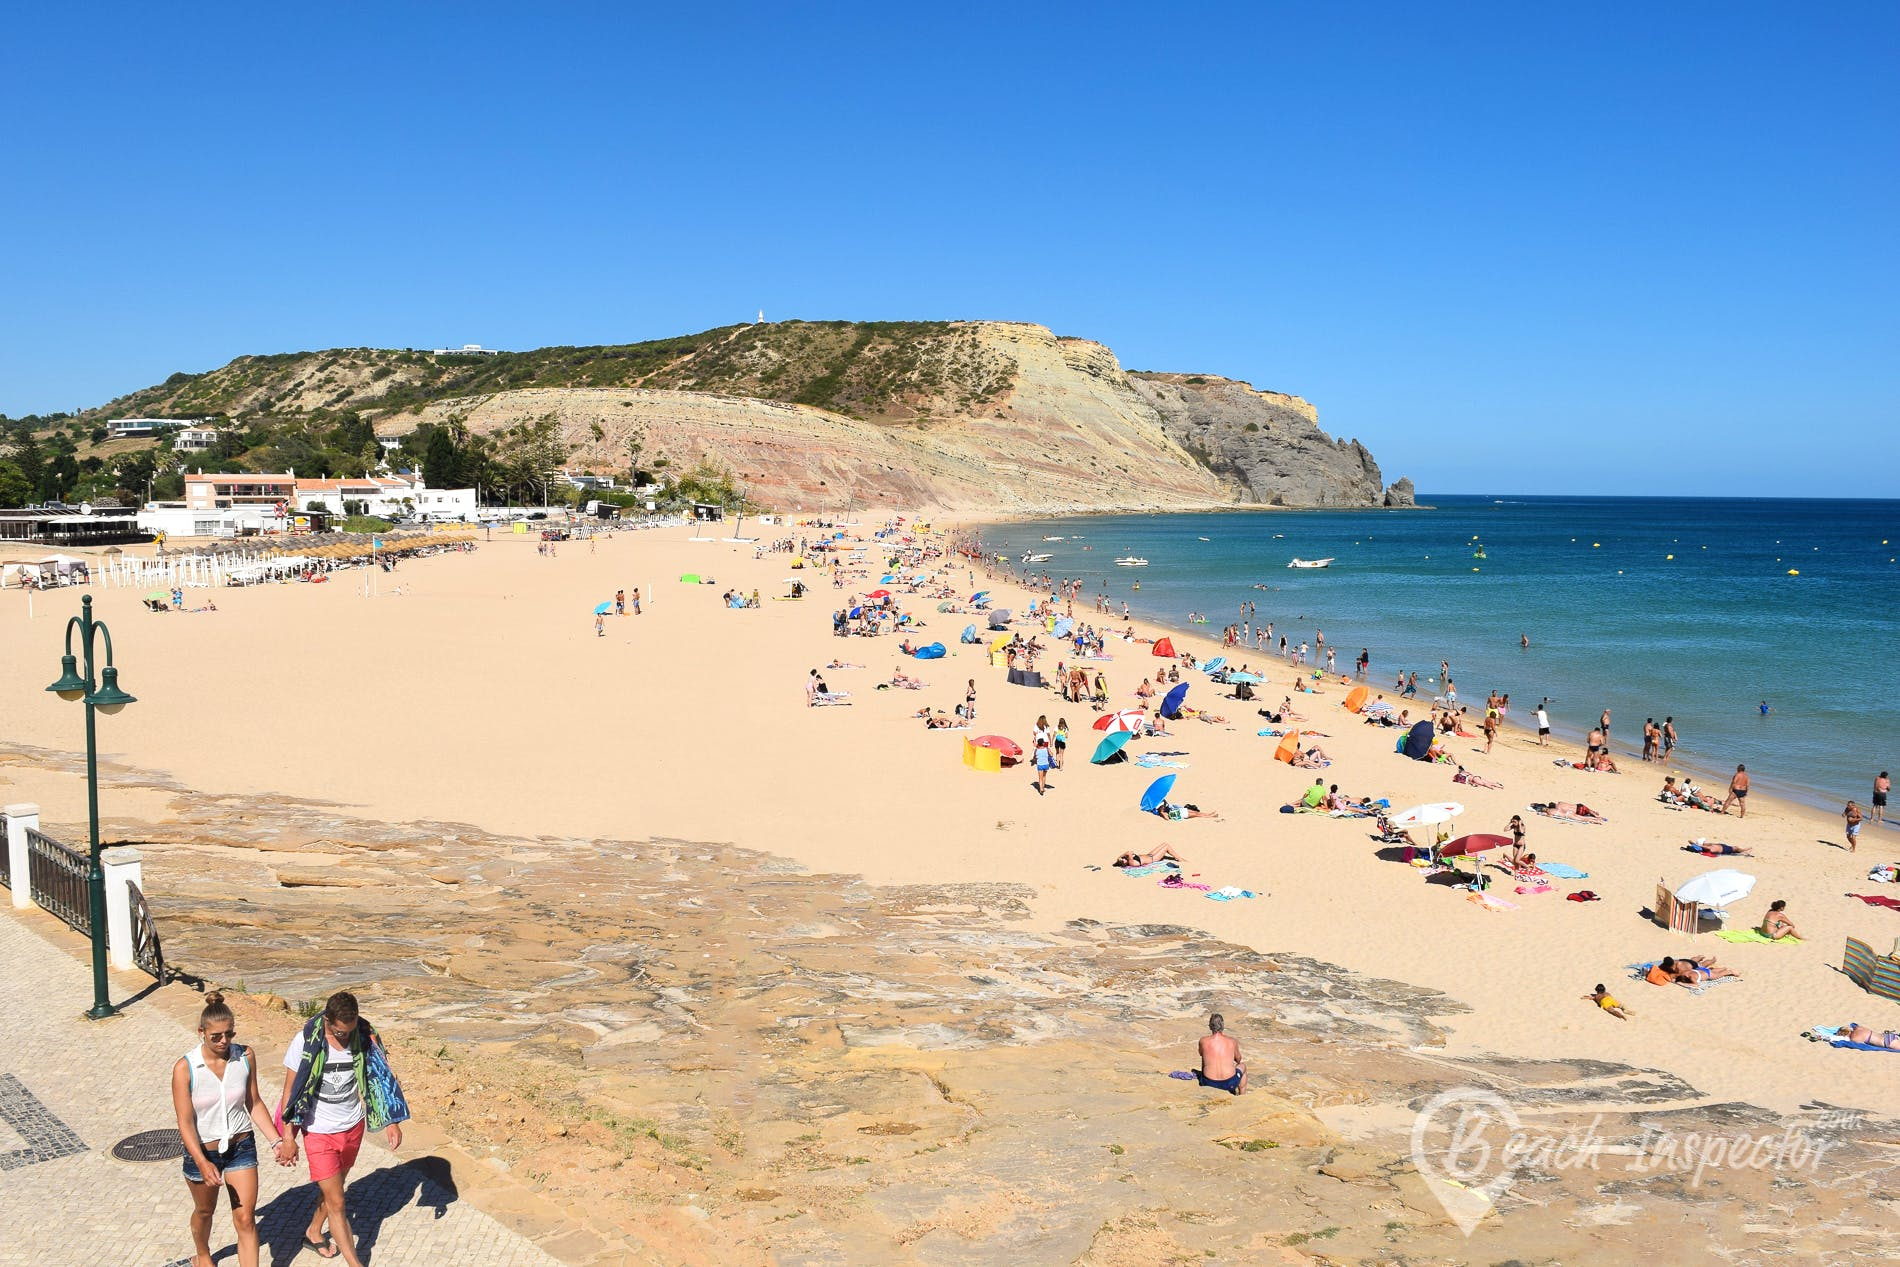 Strand Praia da Luz, Algarve, Portugal